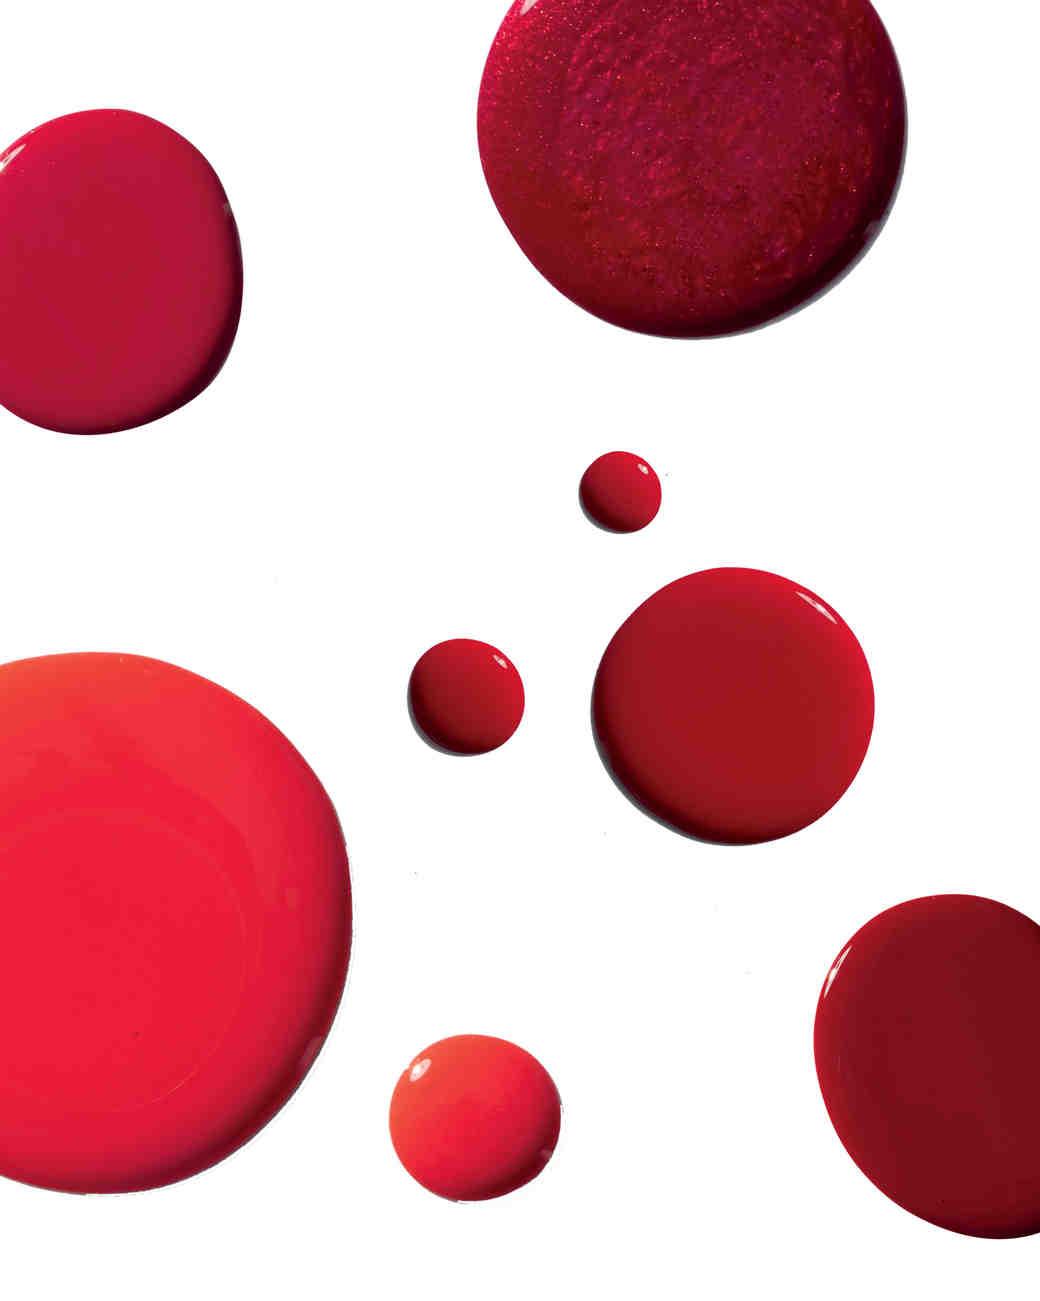 big-day-beauty-nail-polish-collage-2015-0315.jpg